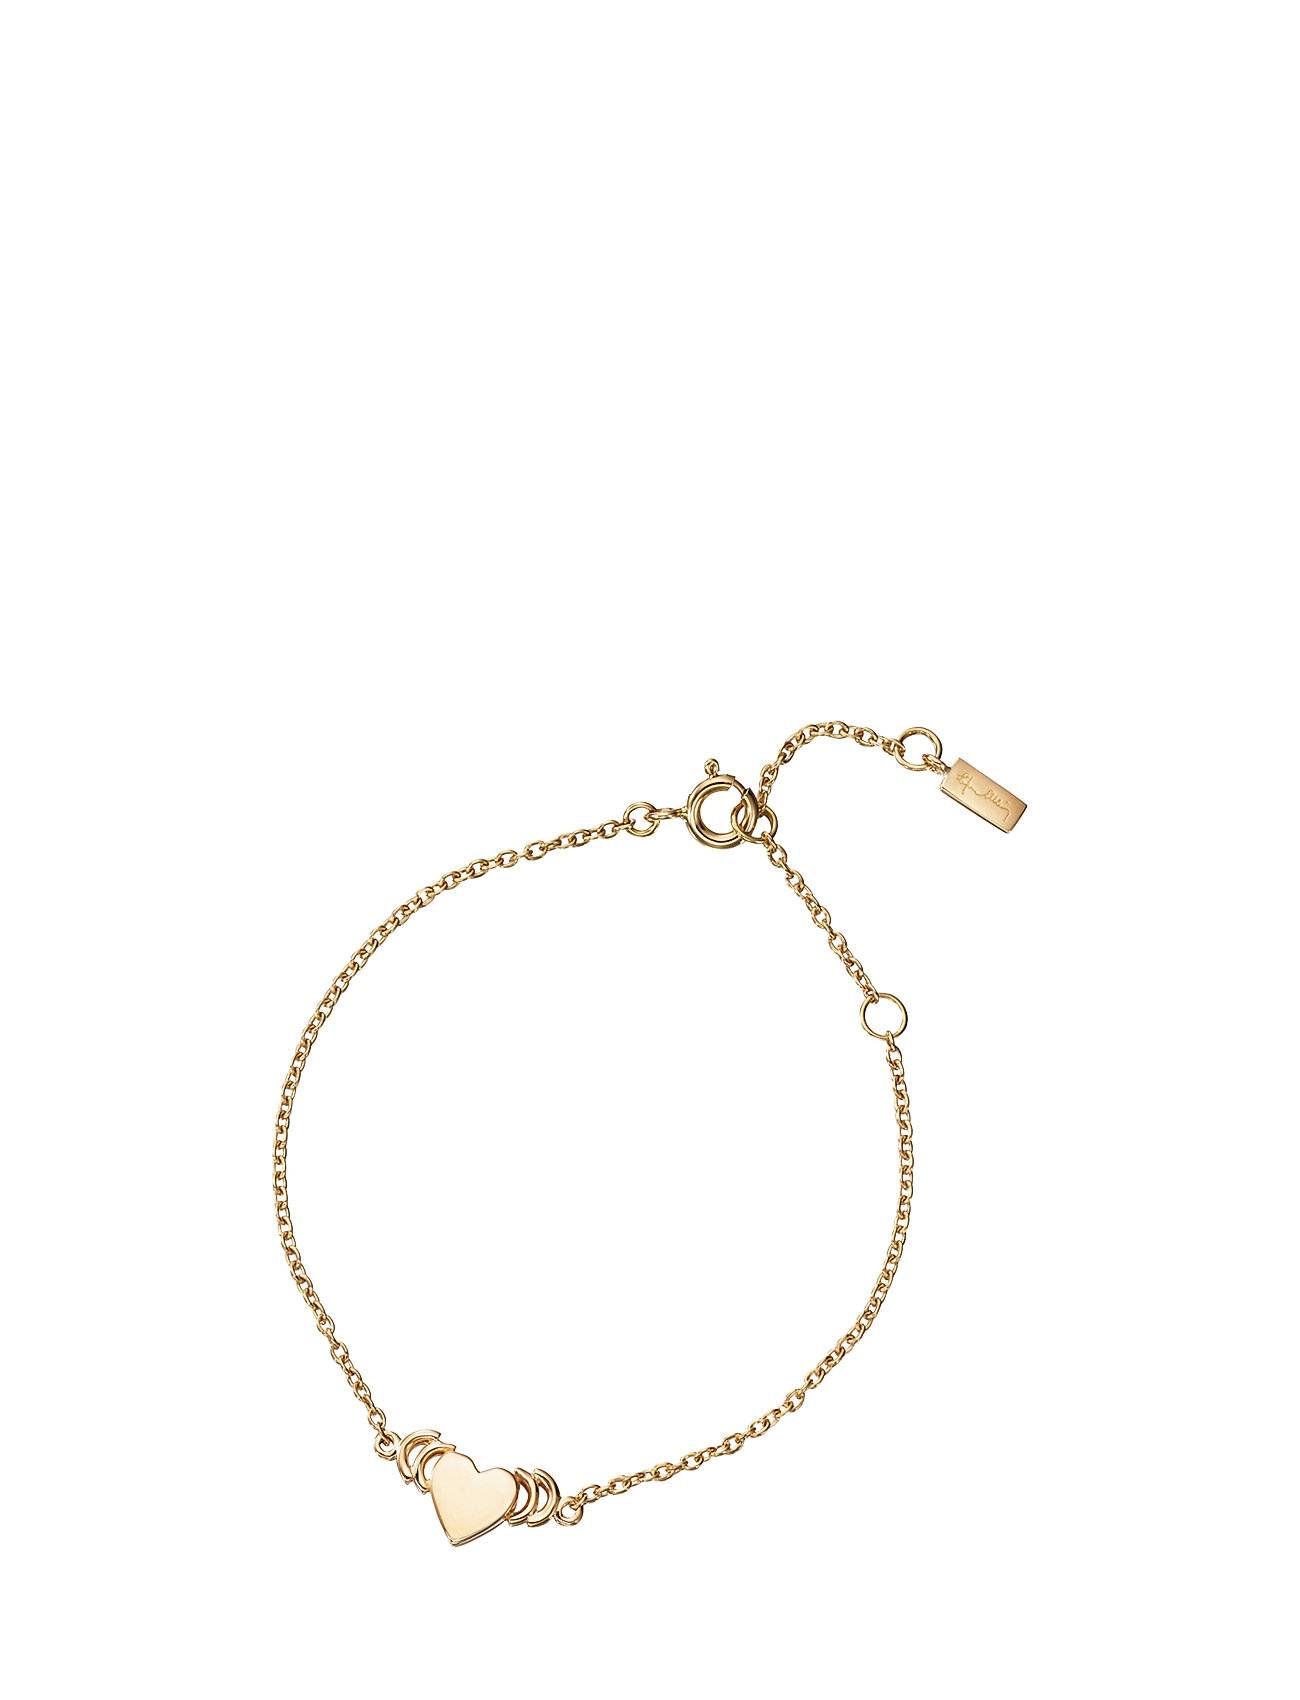 Efva Attling With Love Bracelet